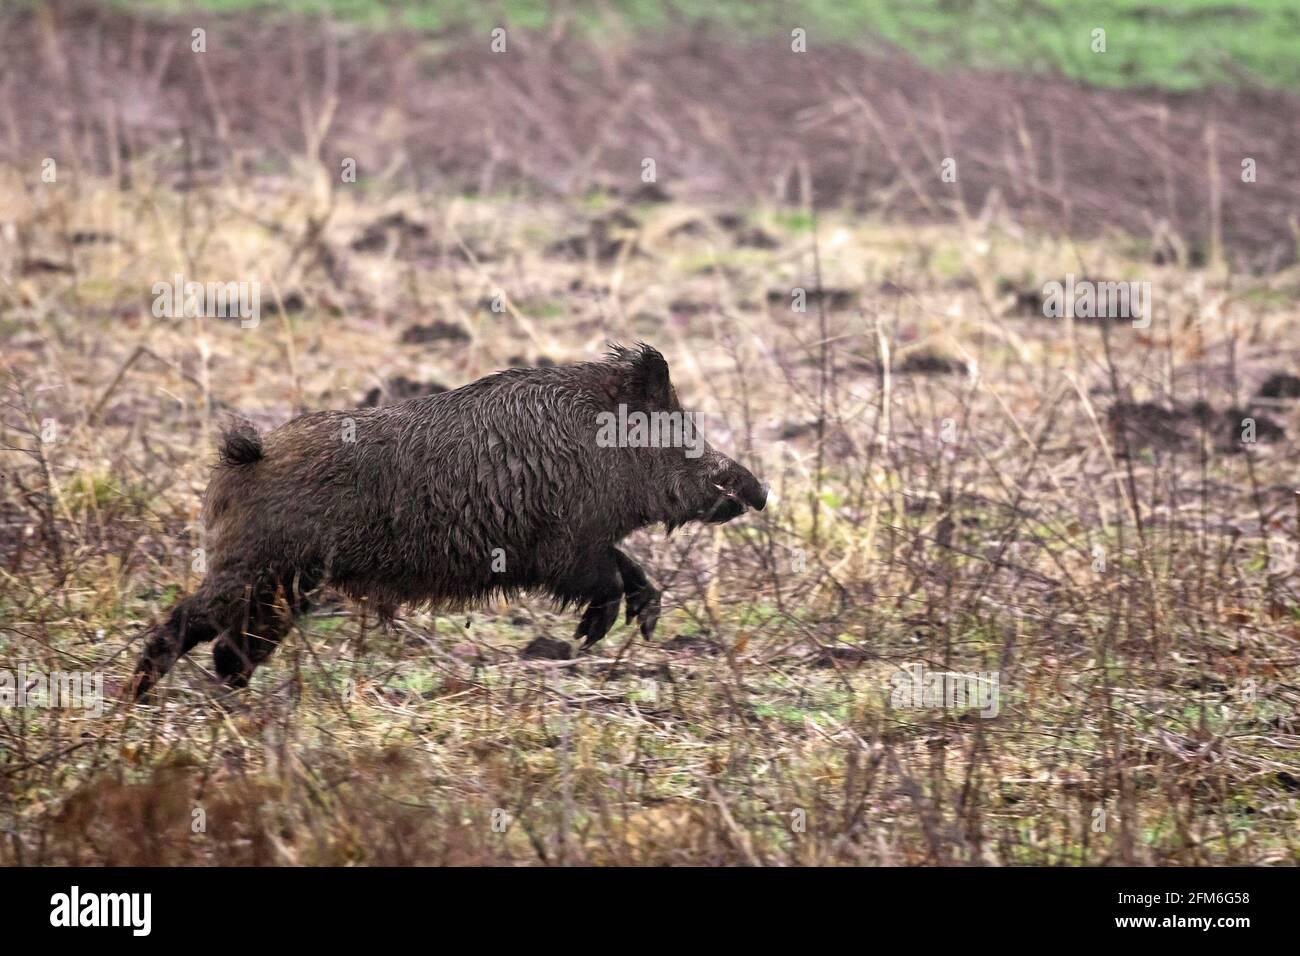 Hunted wild boar (Sus scrofa) running / fleeing over field during battue Stock Photo